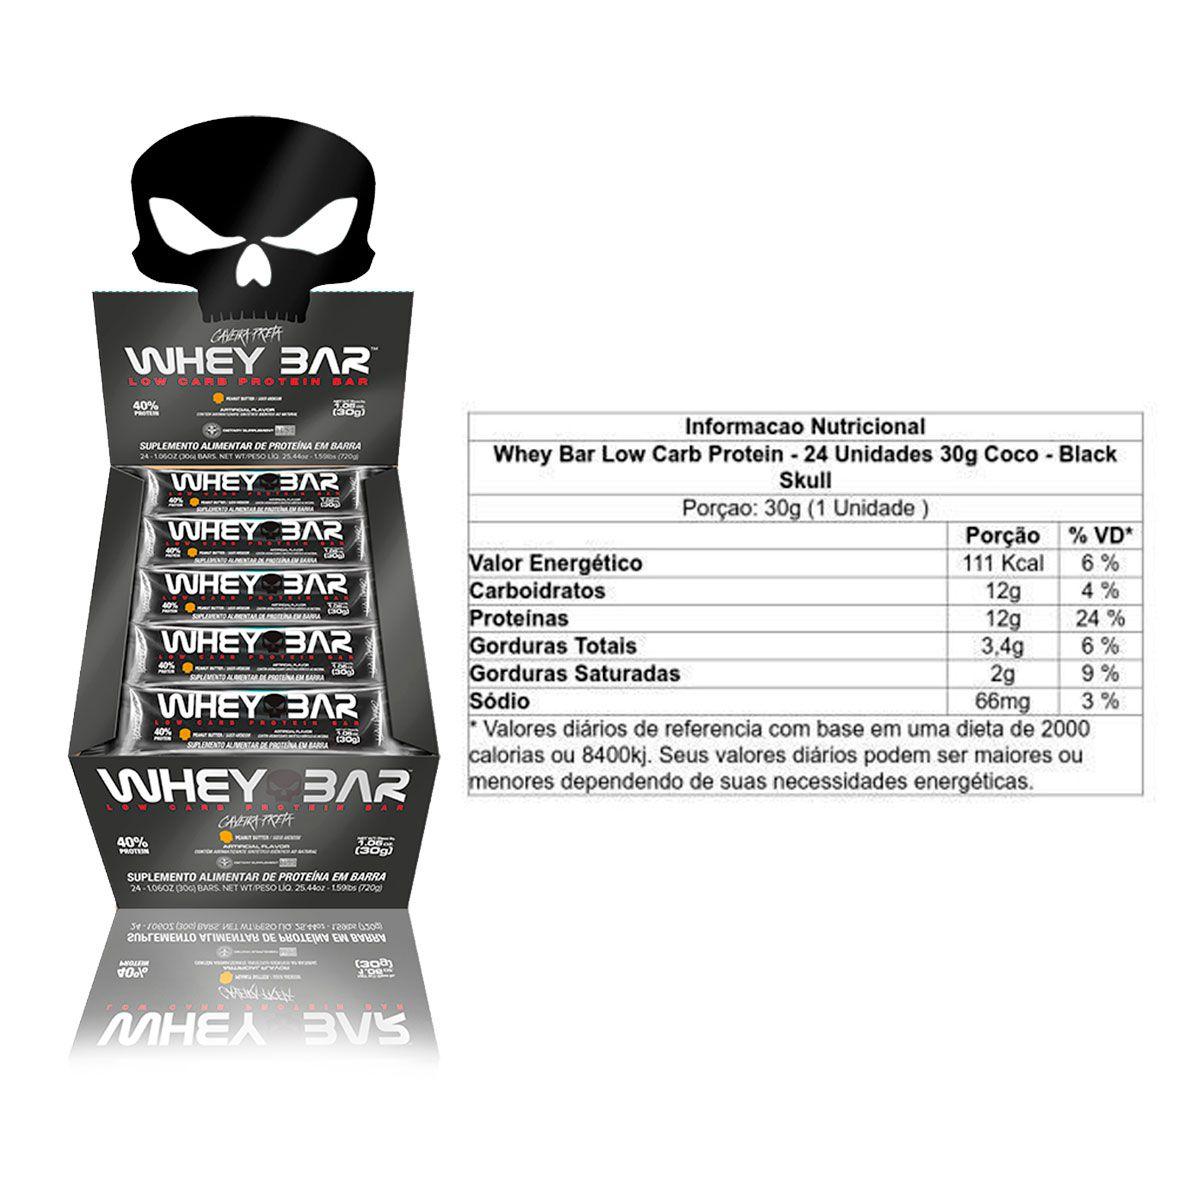 Kit Display Com 24 Unidades Whey Bar 30g + Mochila Saco Military Trail - Black Skull/Midway